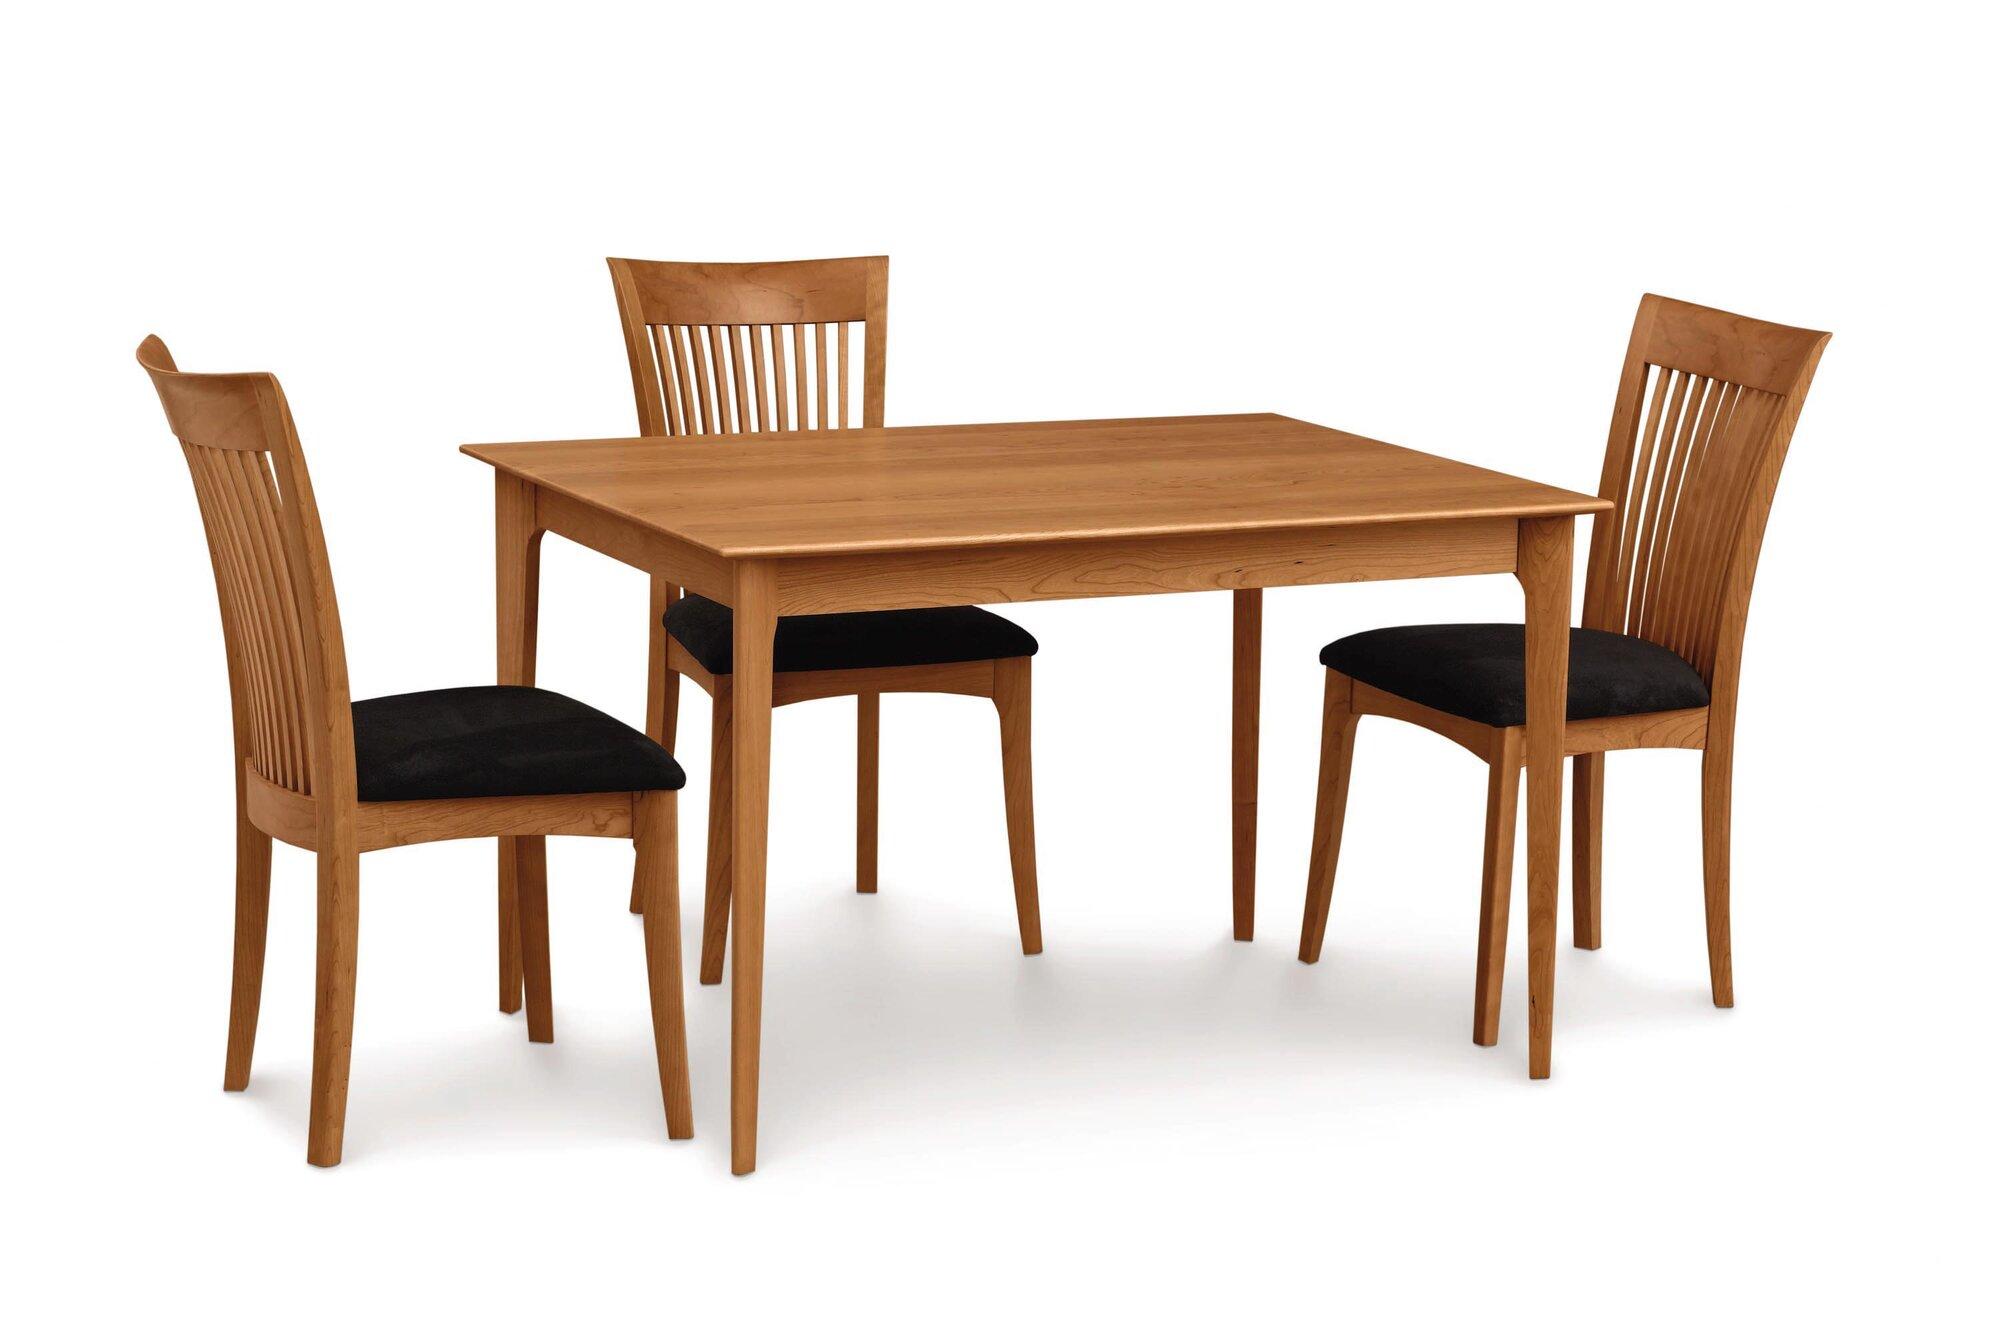 Copeland Furniture Sarah Dining Table Finish: Cognac Cherry, Size: 30